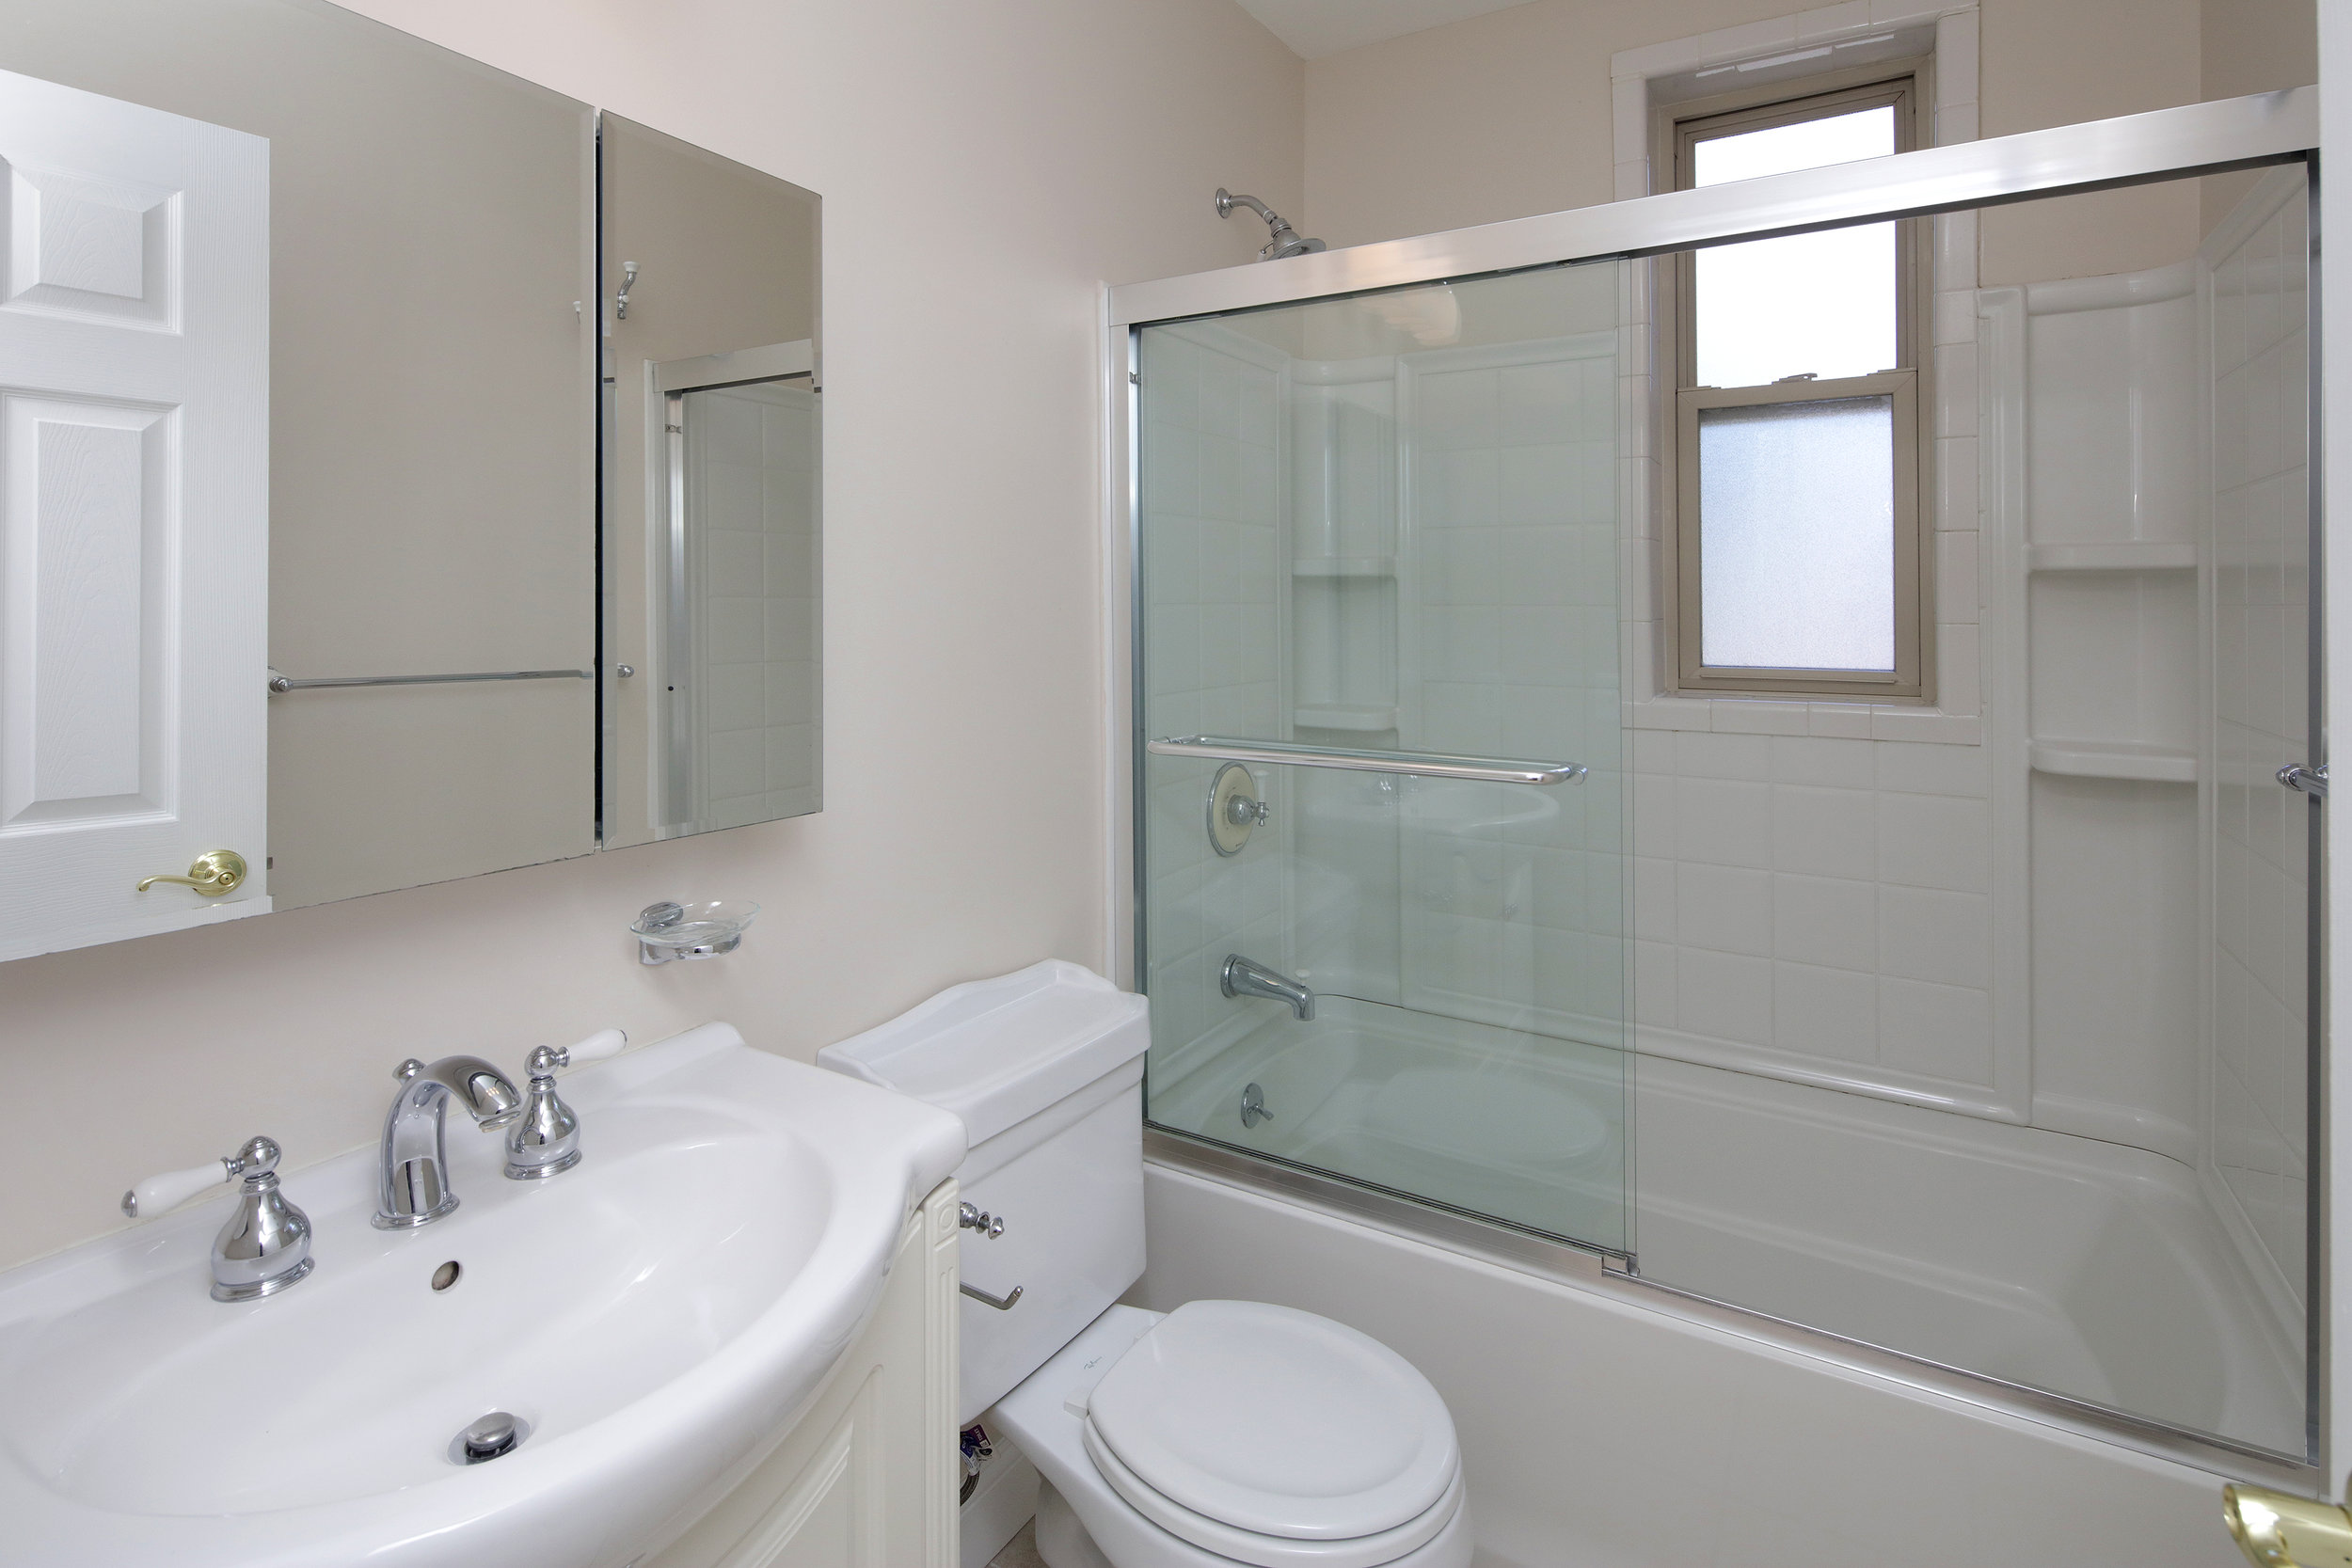 2 Bed Large Bath